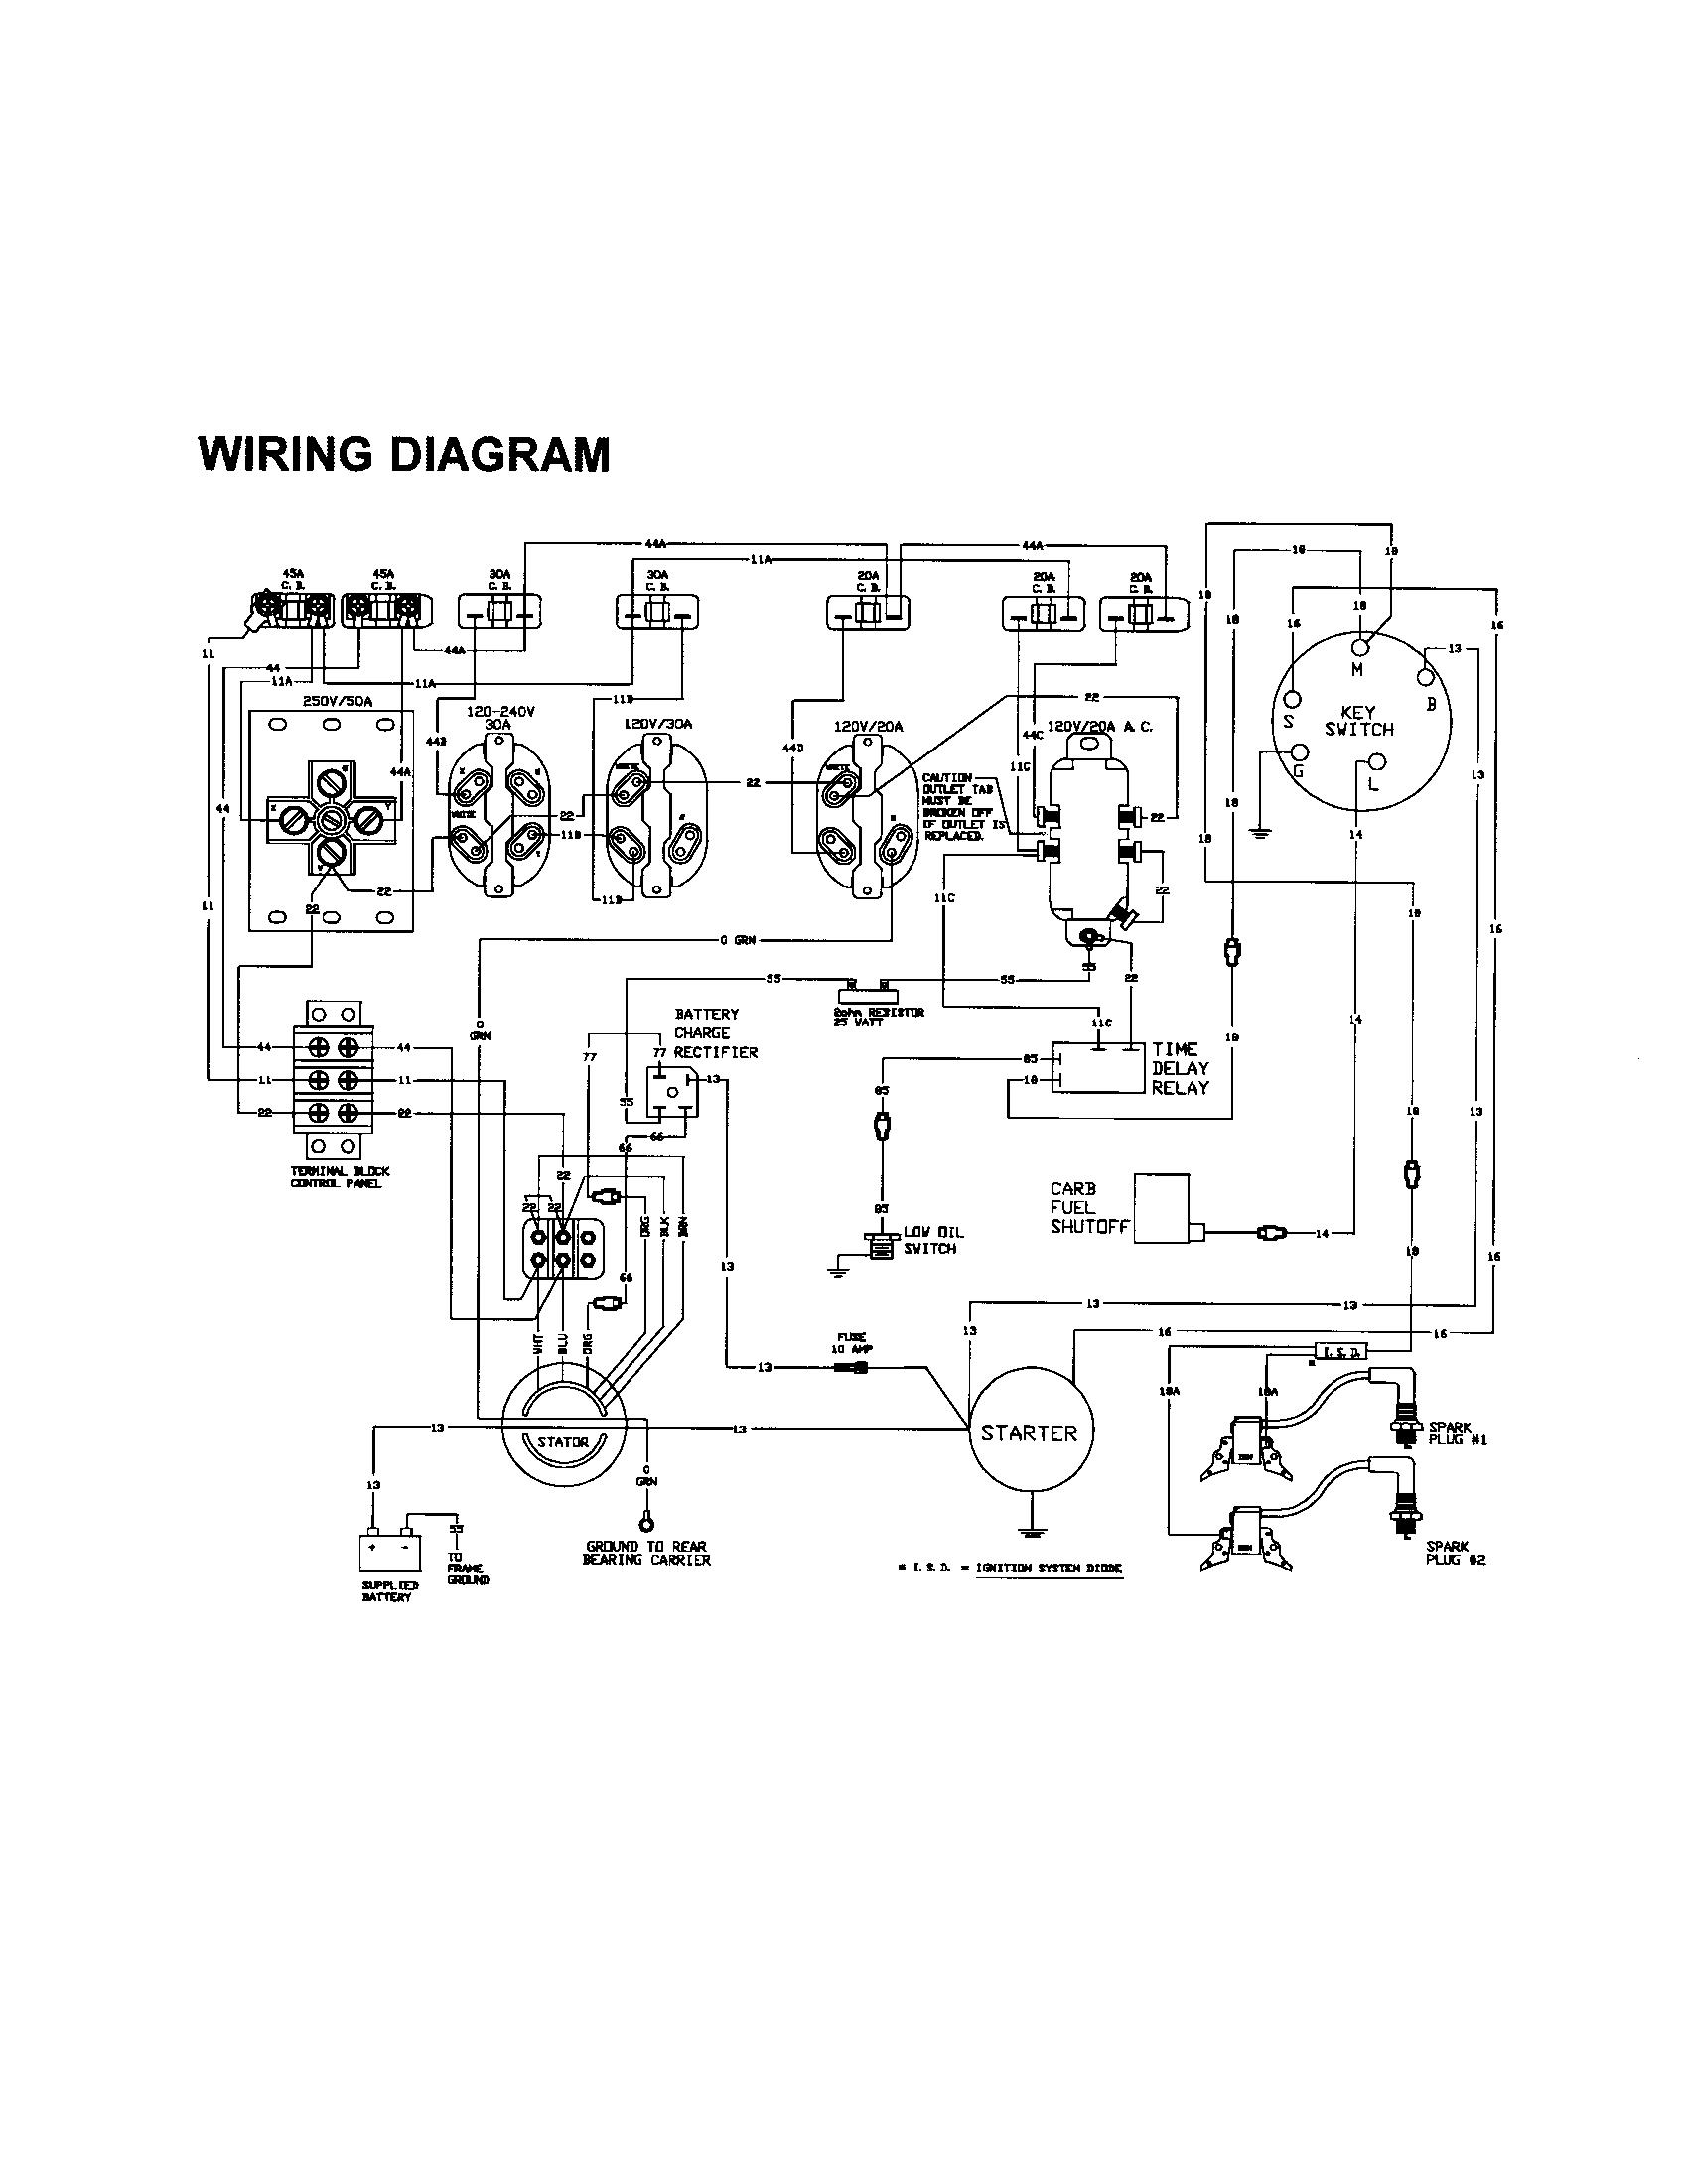 Generac 6500E Generator Wiring Diagram   Manual E-Books - Generac Generator Wiring Diagram